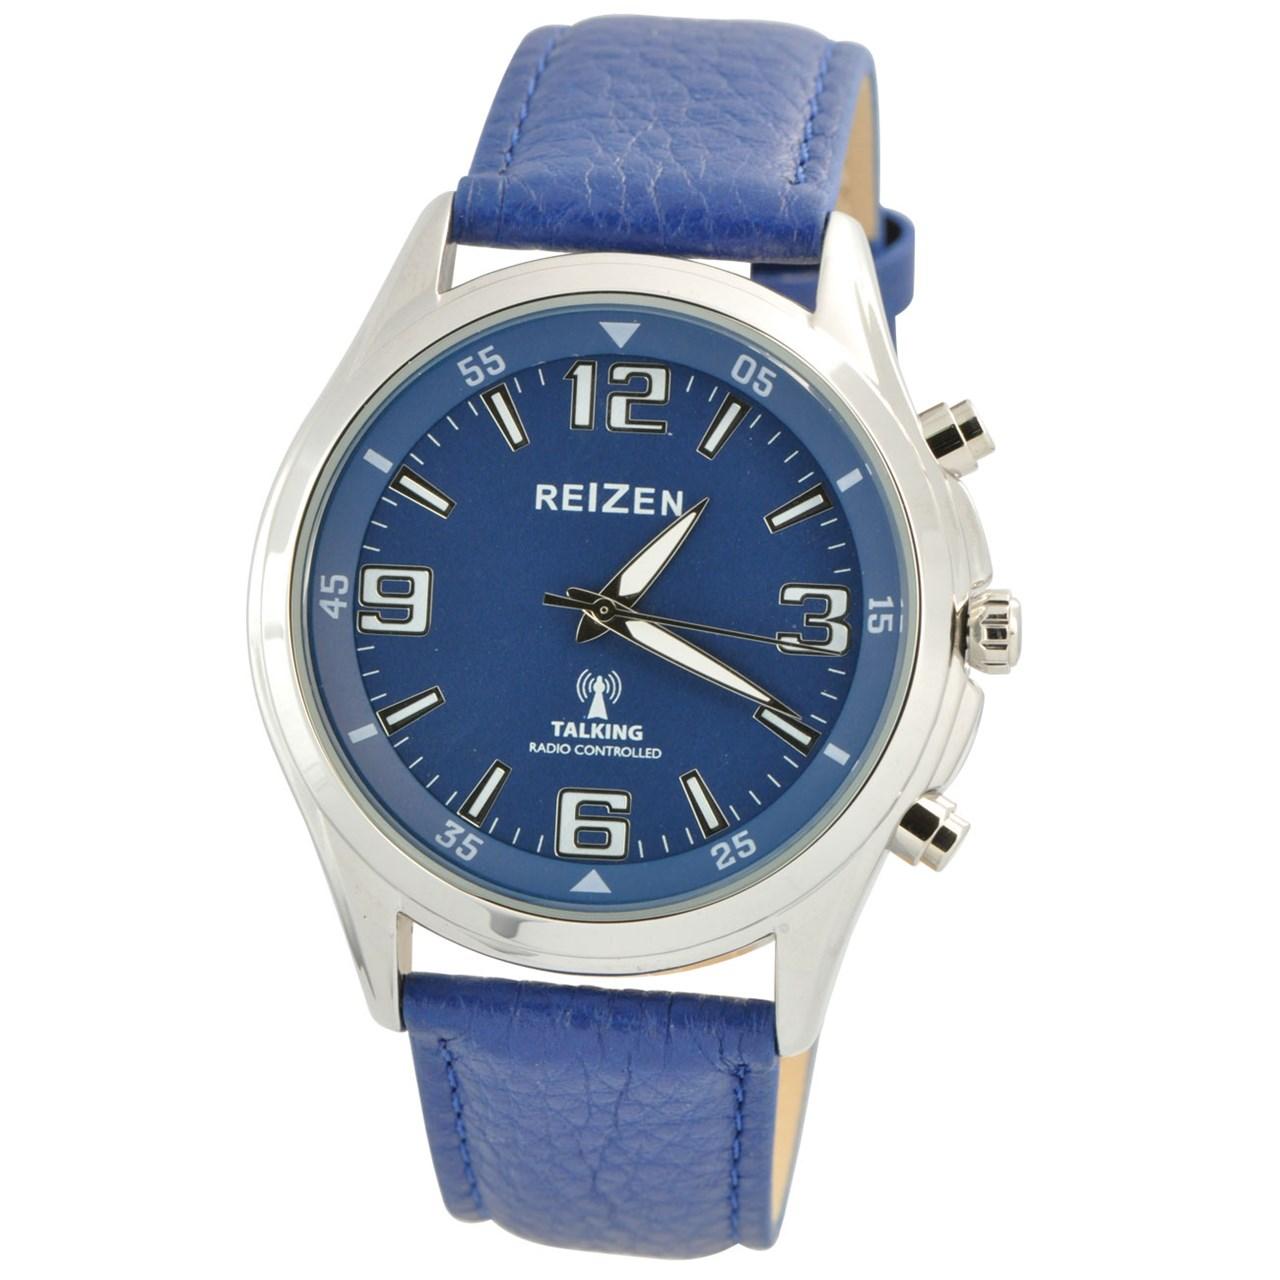 Reizen Talking Atomic Blue Dial Chrome Watch - Blue Leather Band